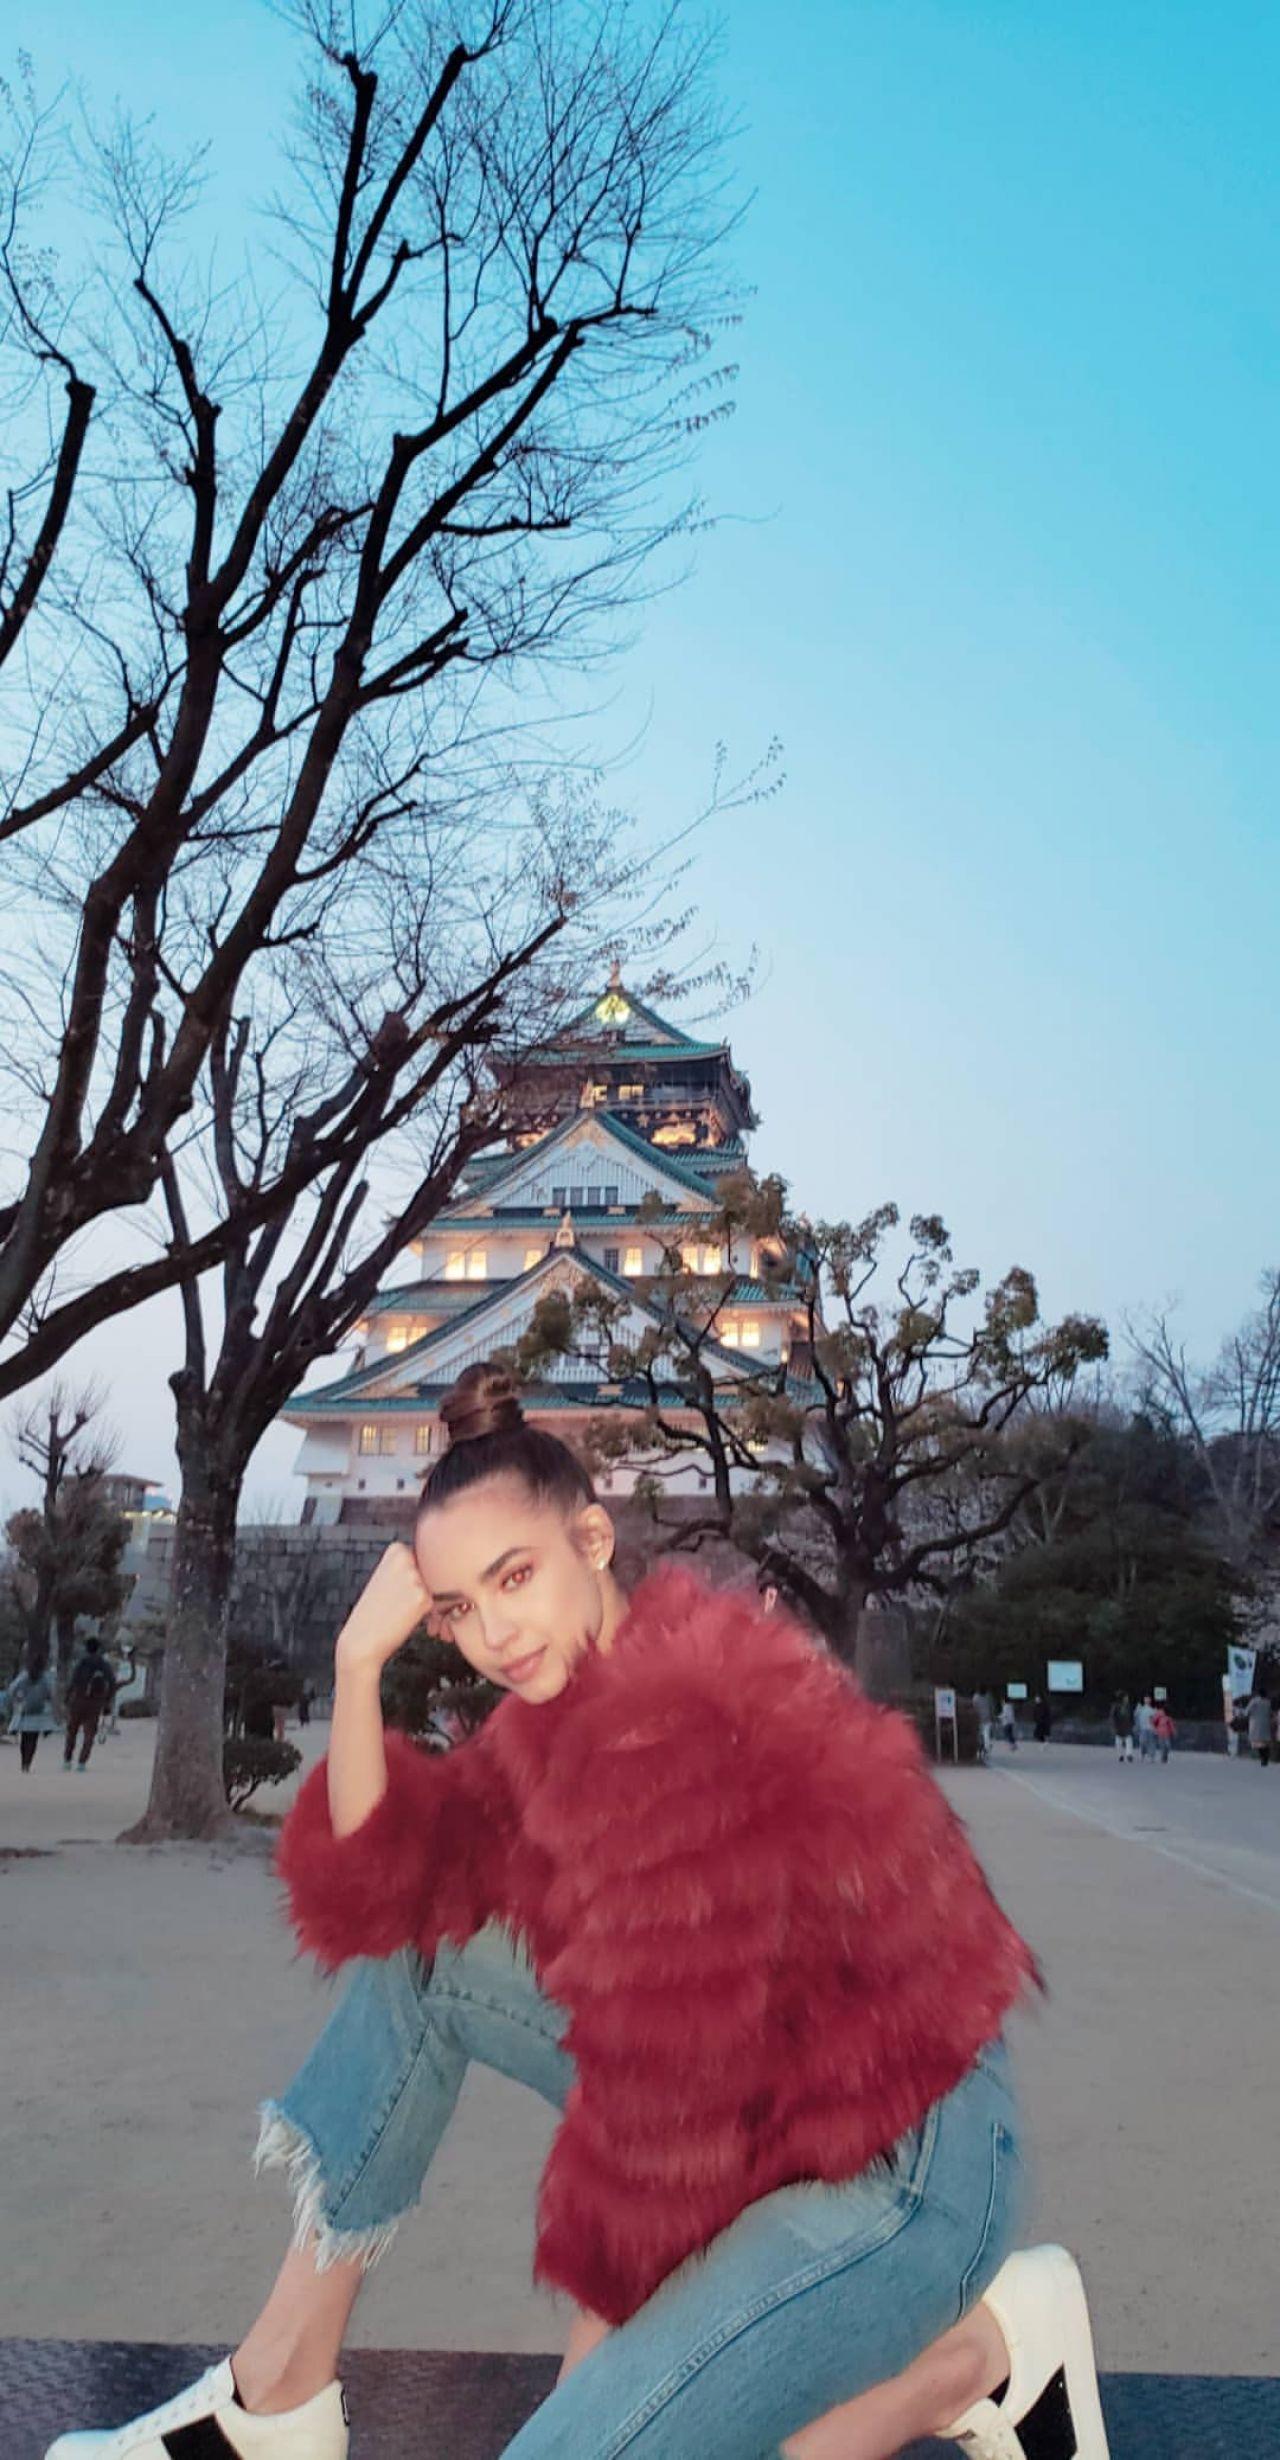 Sofia Carson Social Media 04 03 2018